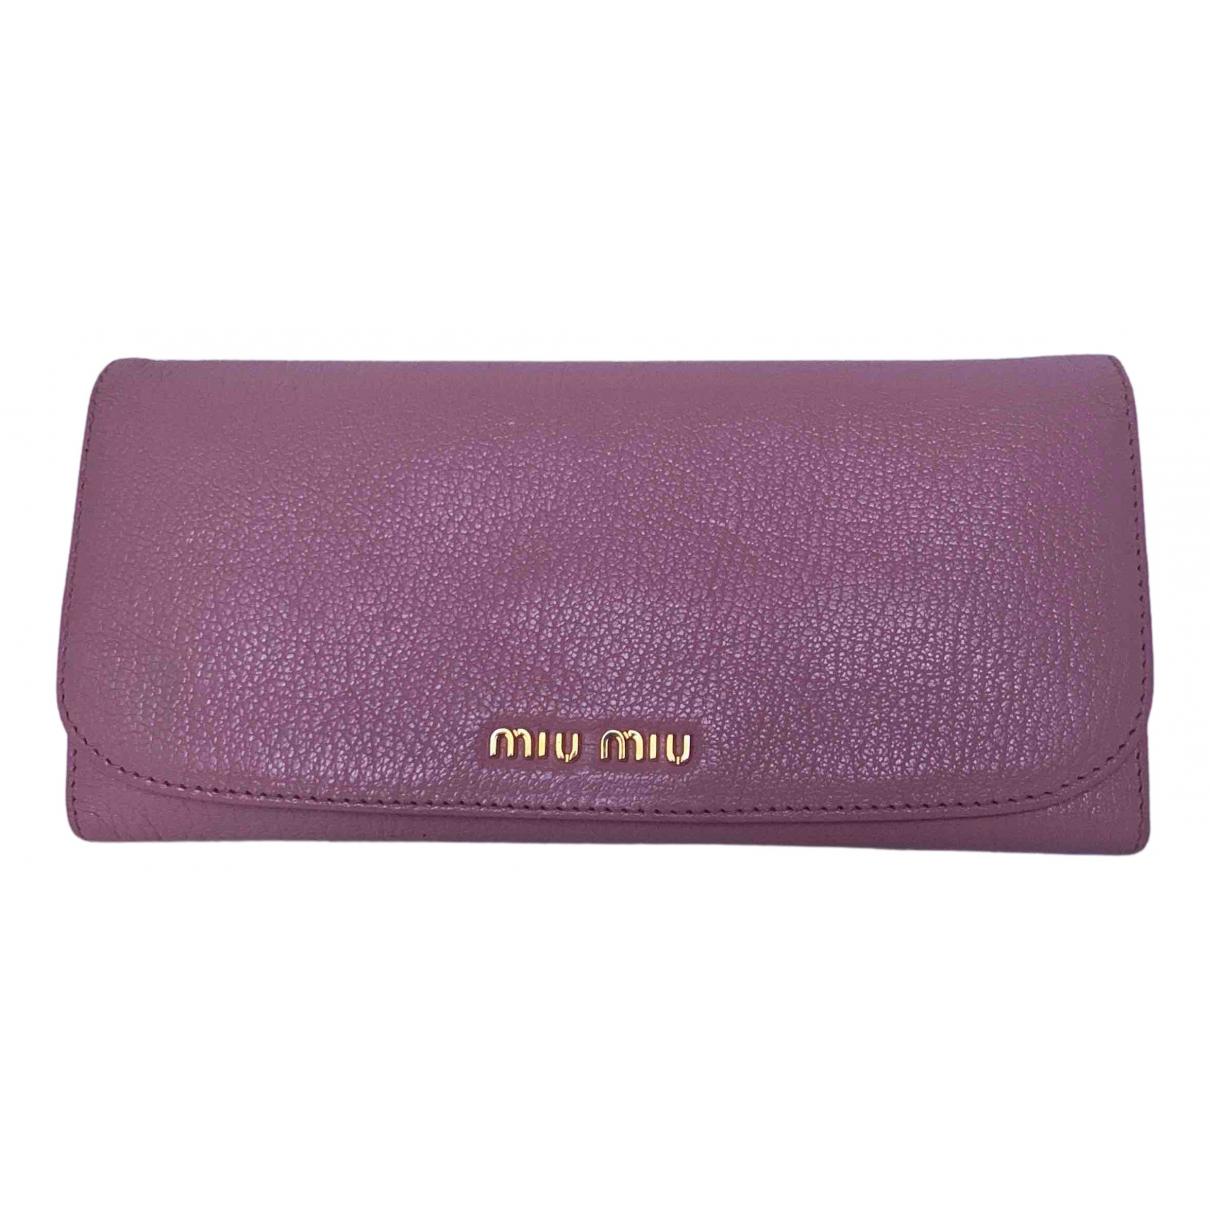 Miu Miu N Pink Leather Purses, wallet & cases for Women N